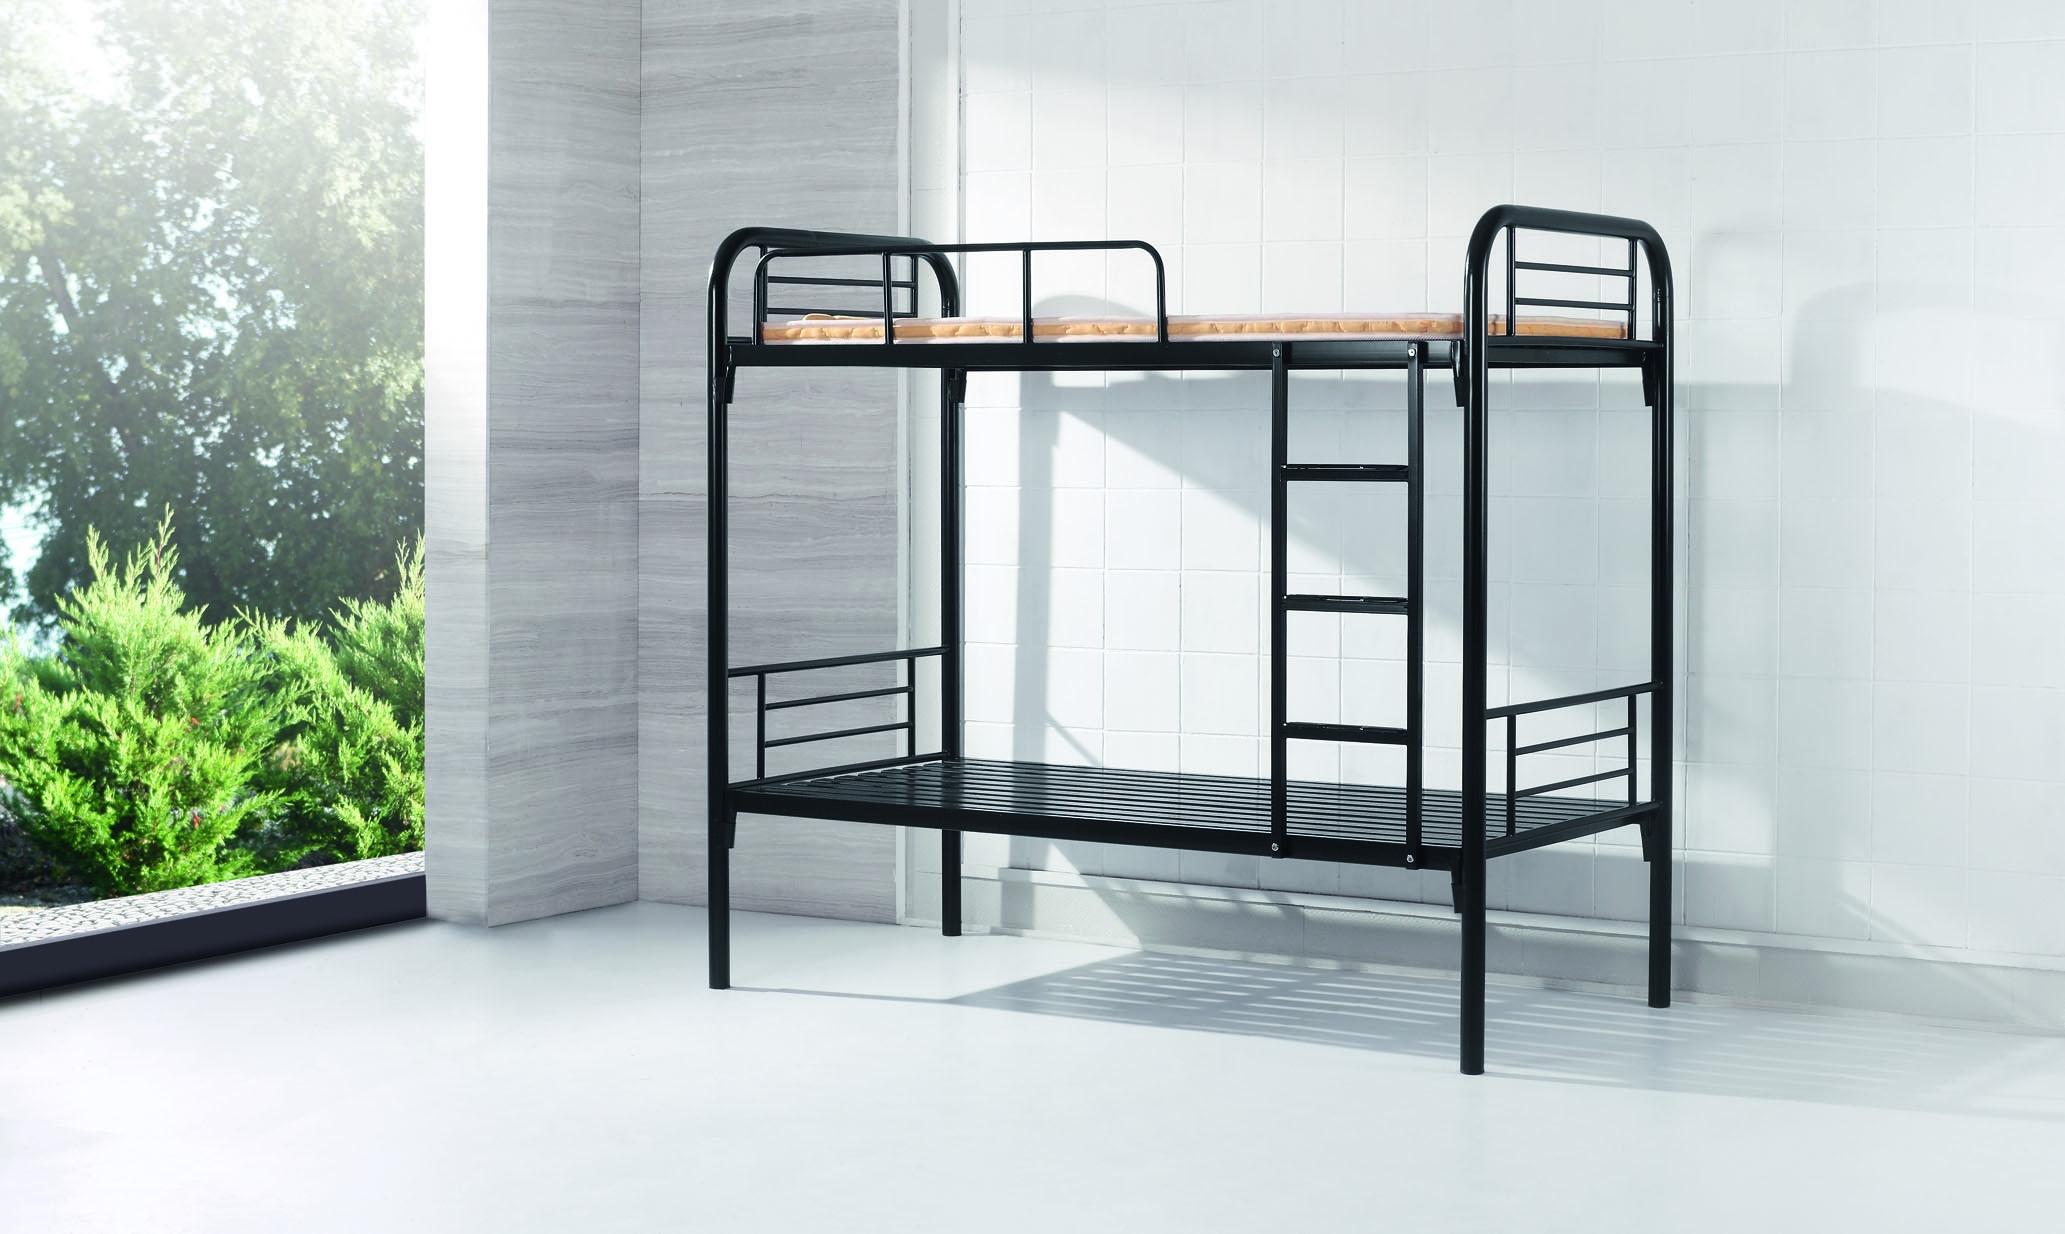 Metal Bedroom Furniture Sets Twin School Metal Beds King Size Bunk Bed Metal Bed Frame Bedroom